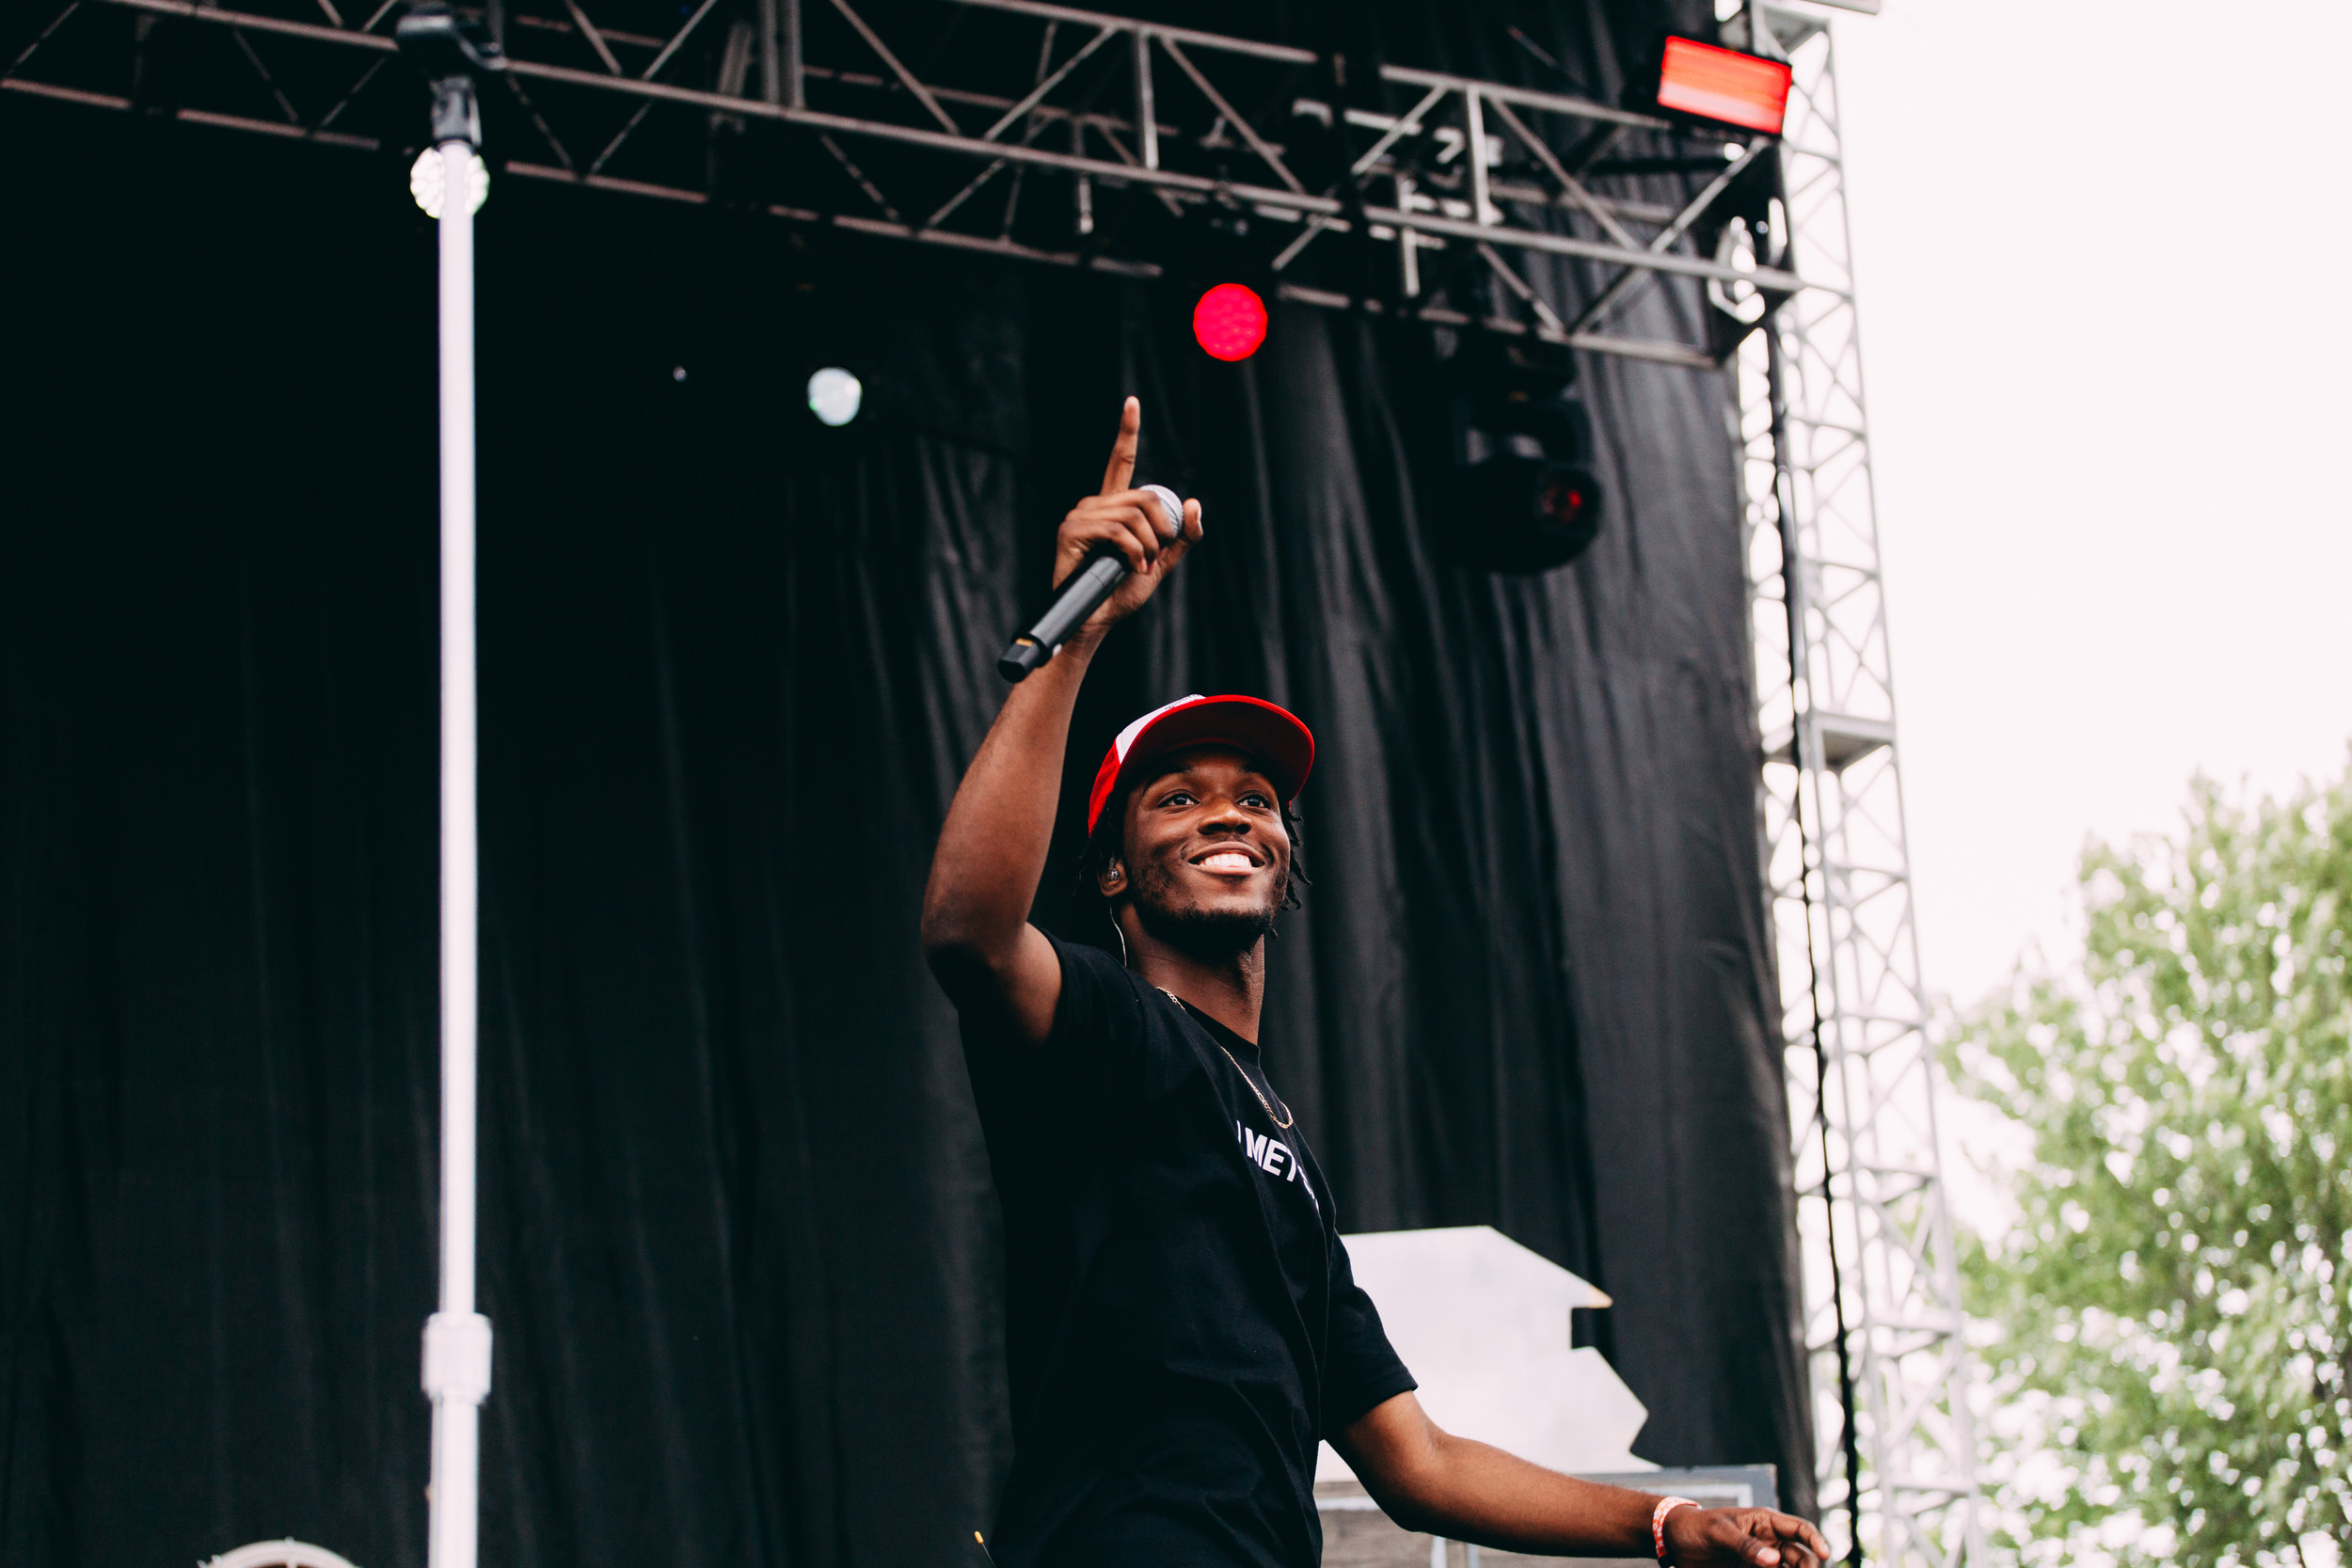 Saba performs at Pitchfork 2018 (Photo by Michael Salisbury)